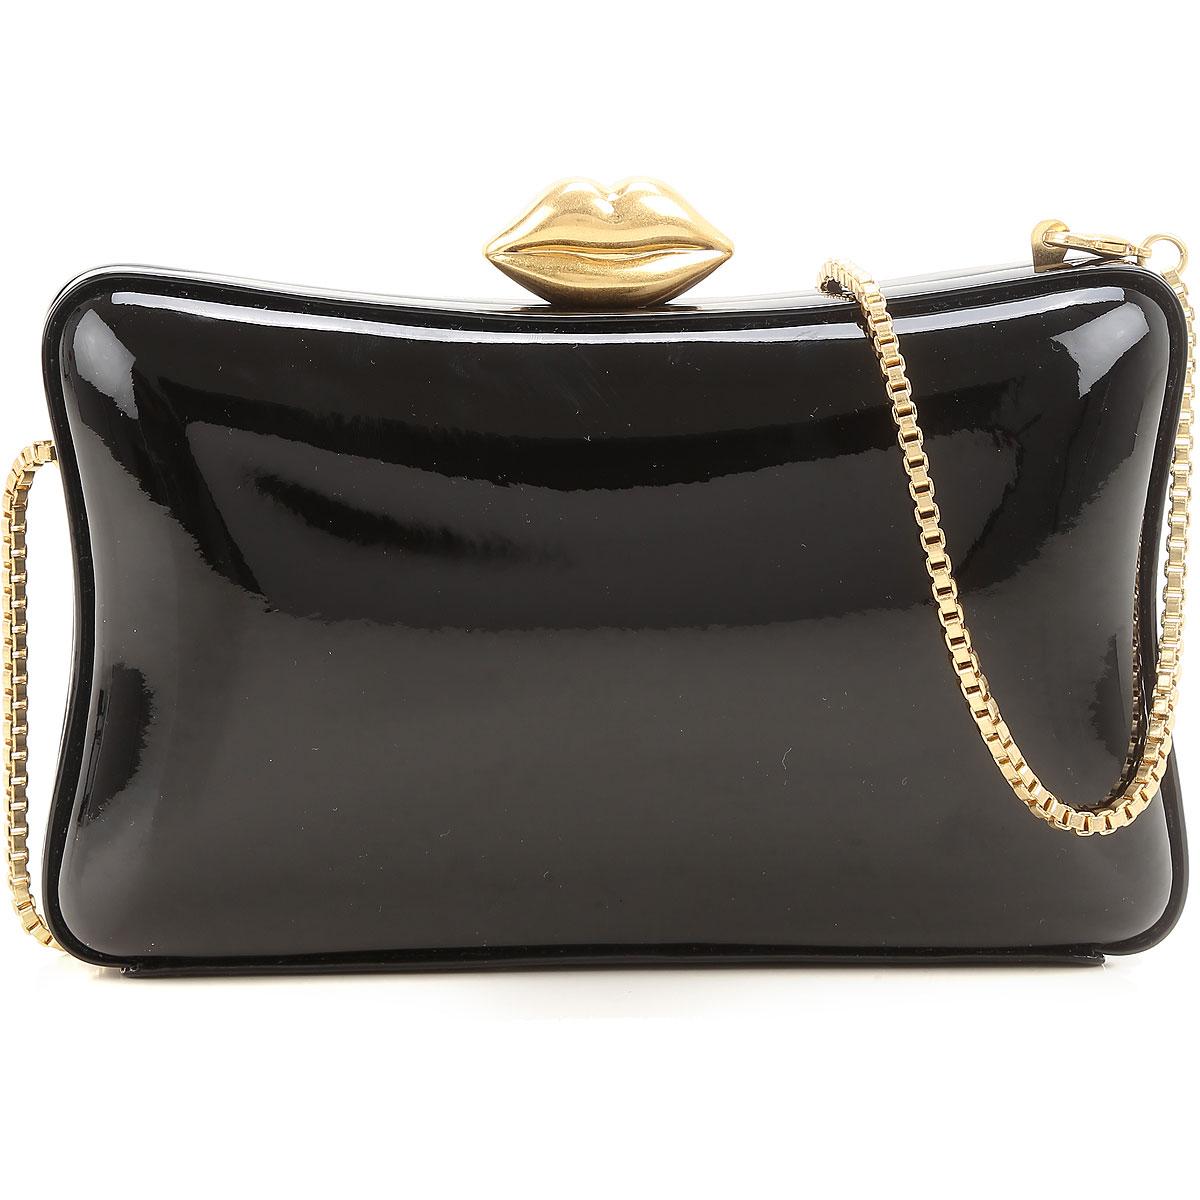 Image of Lulu Guinness Clutch Bag, Black, Patent, 2017